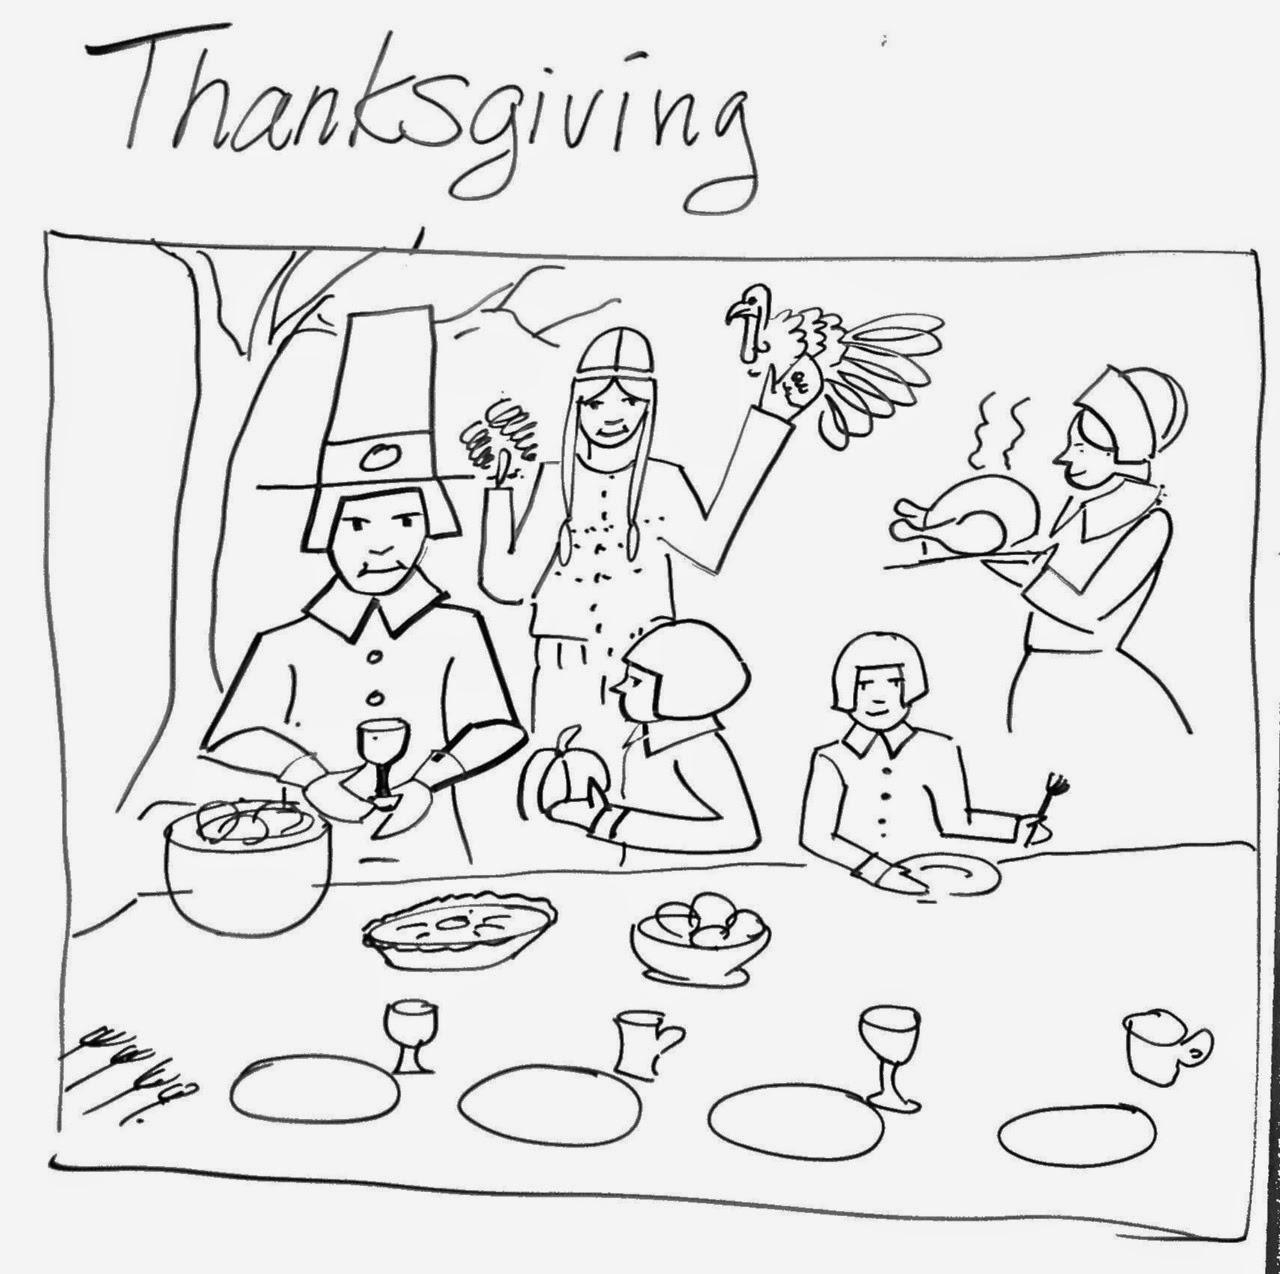 CKNotes 4: November Children's Drawing Classes at Rockland